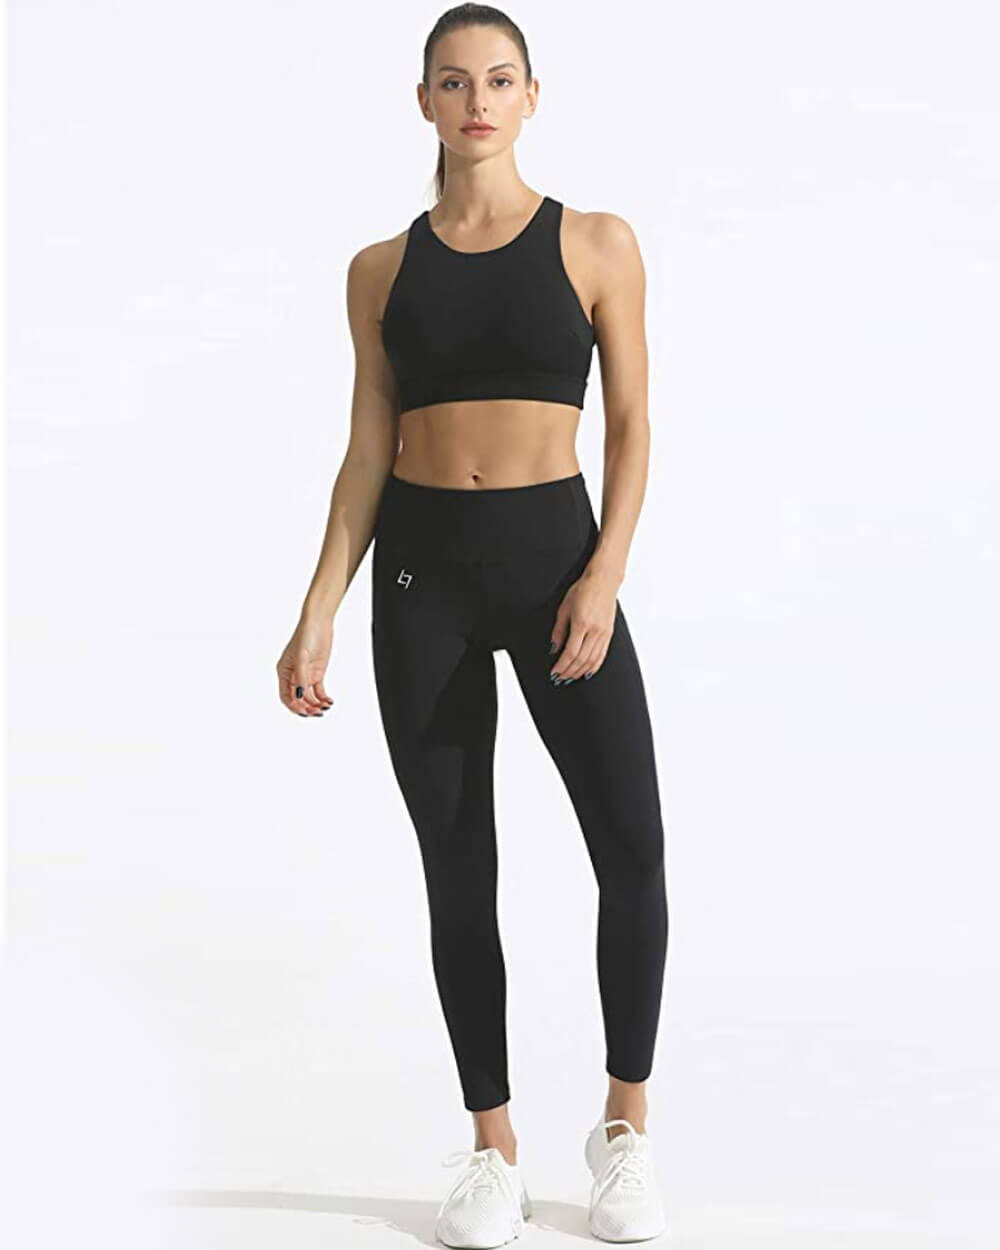 FITTIN cheap workout clothes